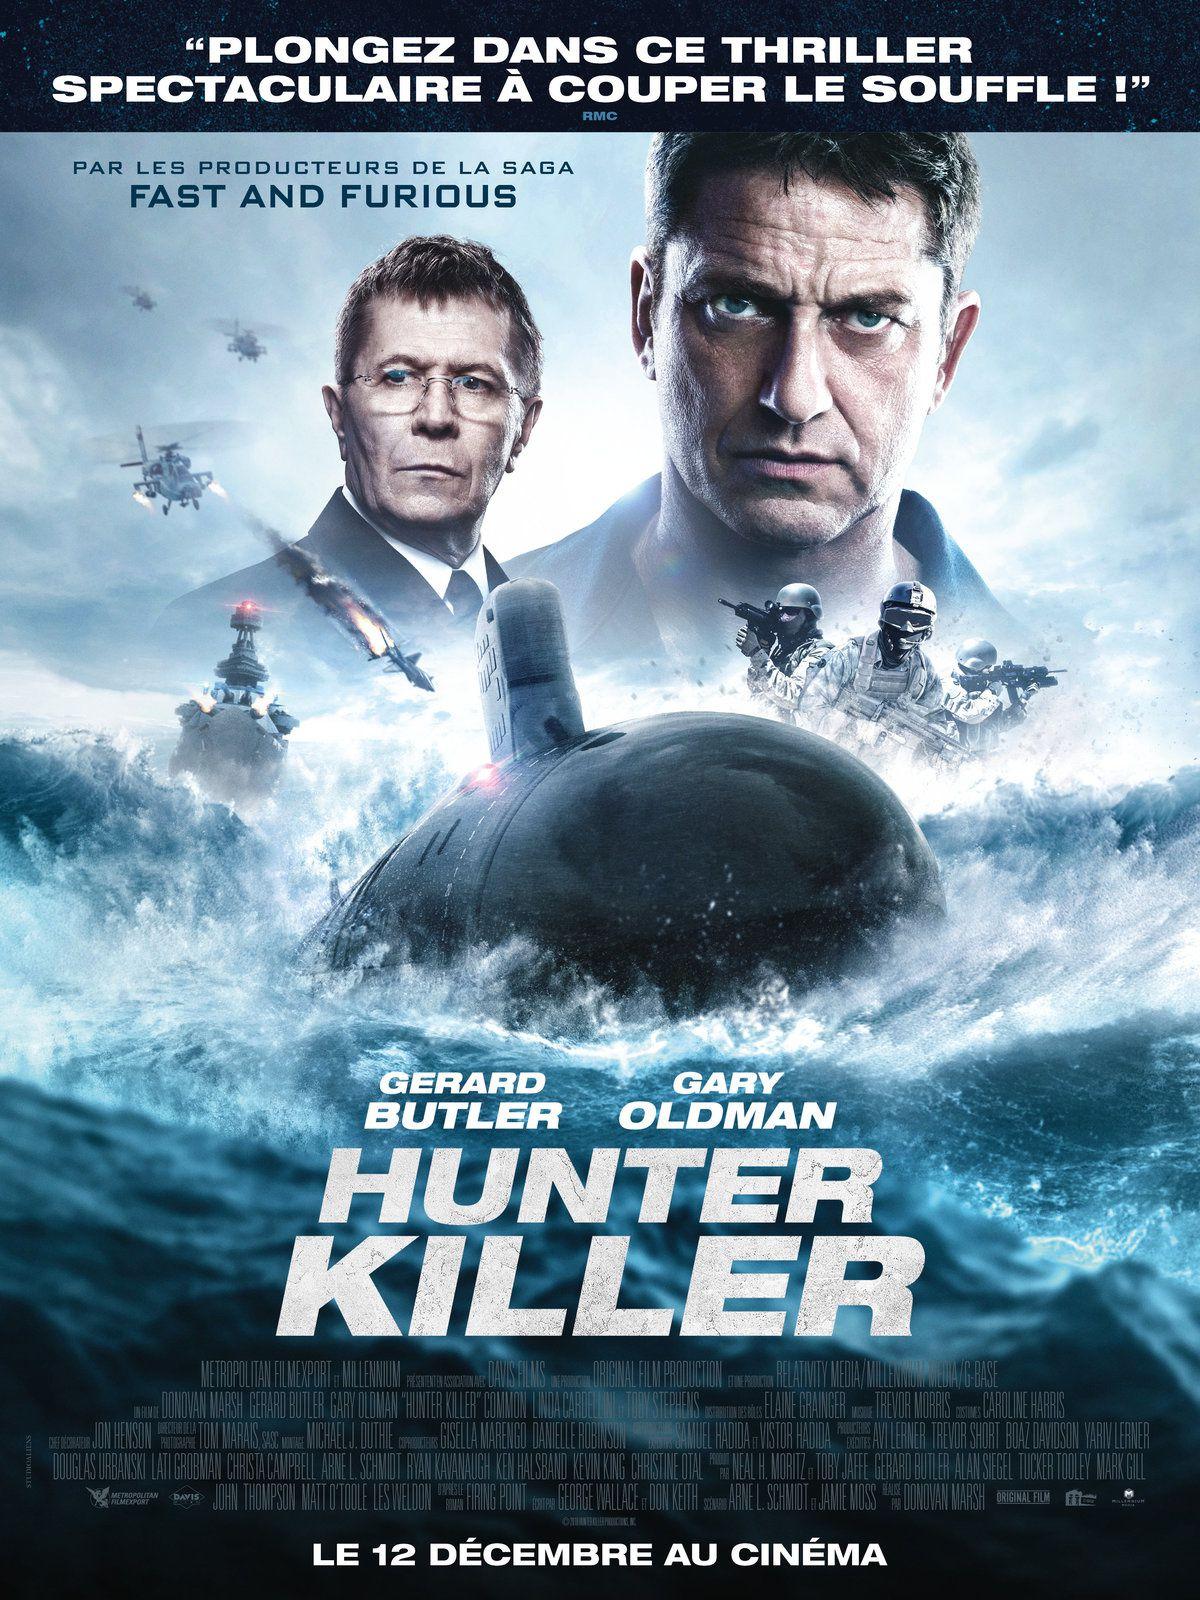 Hunter Killer (2 EXTRAITS) avec Gerard Butler, Billy Bob Thornton, Common, Gary Oldman - Le 12 décembre 2018 au cinéma